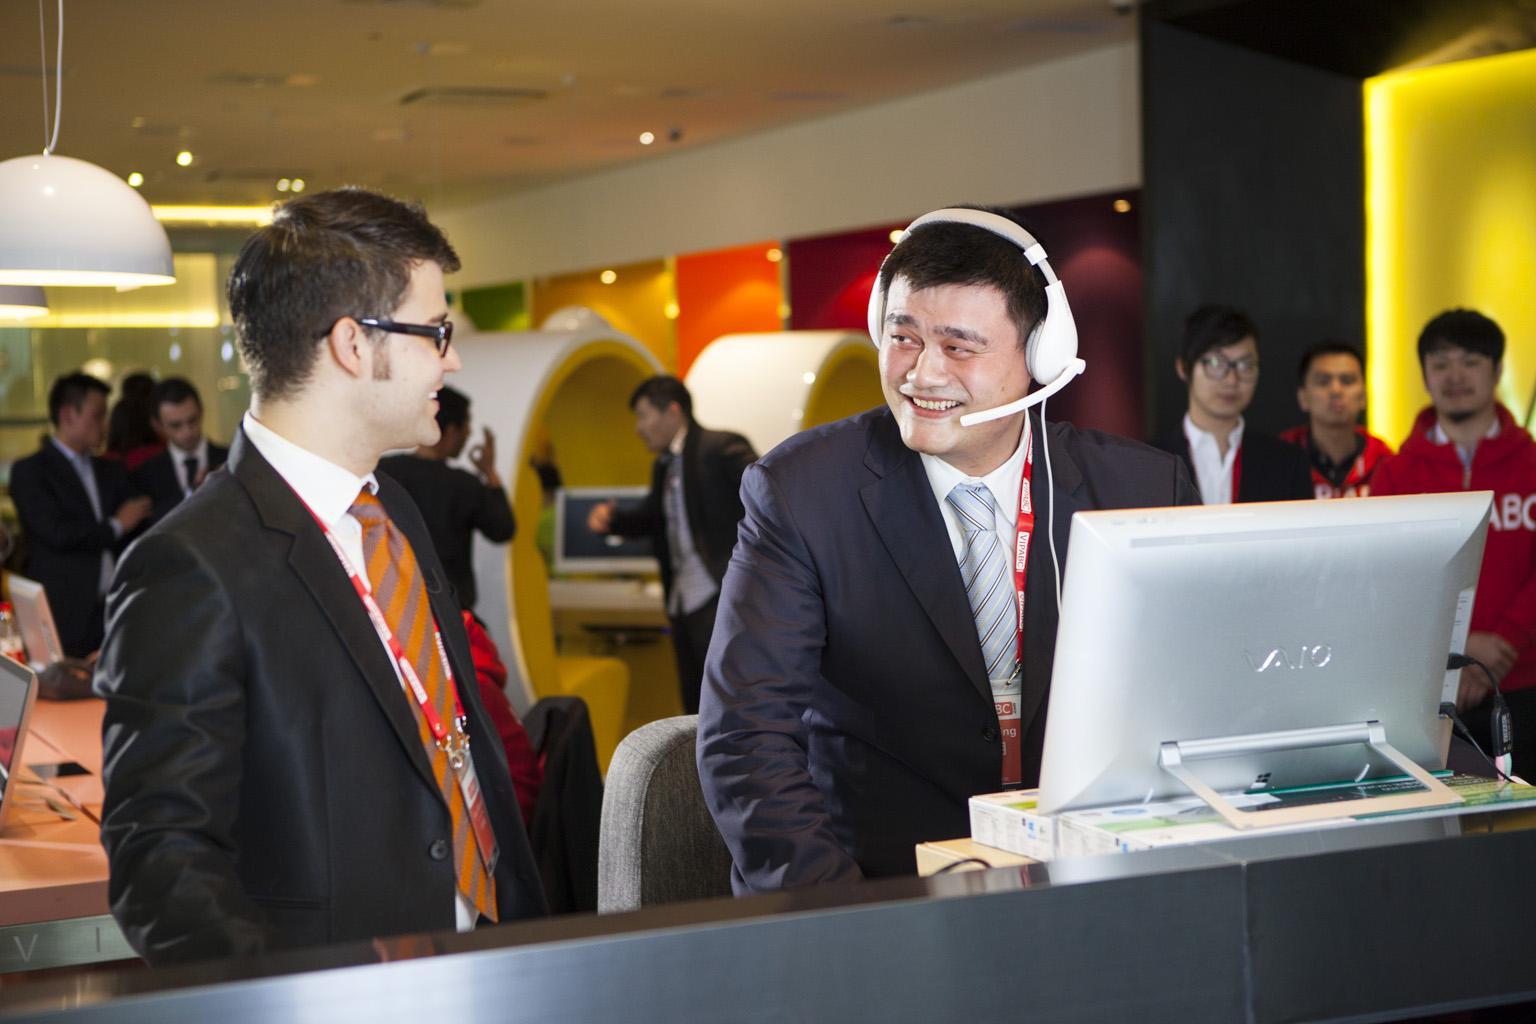 TutorGroup 榮獲2014中國年度城市最佳雇主China Best Employer Award-TutorABC延攬台灣高科技專業人才 進軍國際 (1)